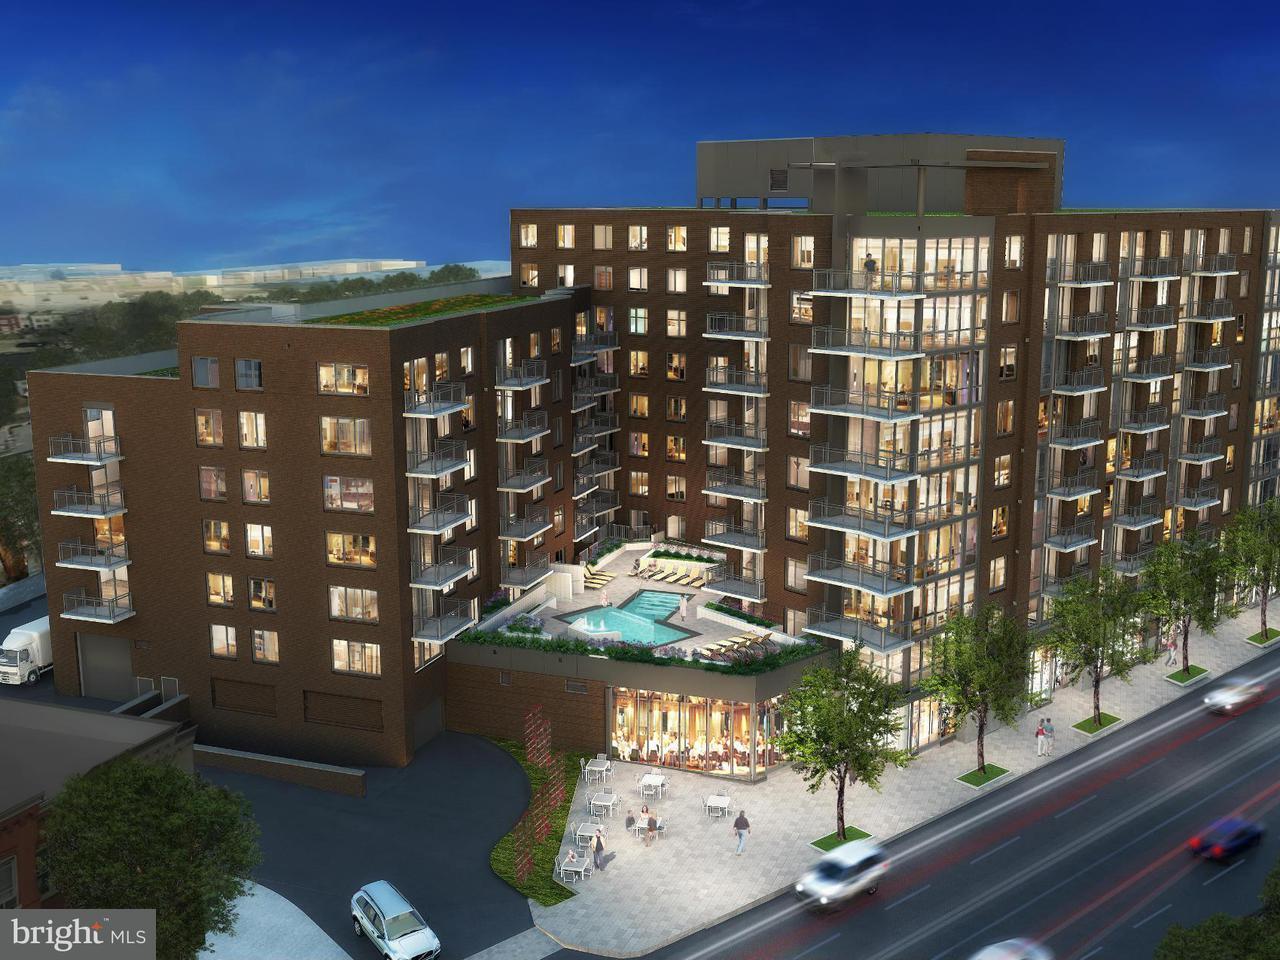 Condominium for Sale at 50 Florida Ave Ne #301 50 Florida Ave Ne #301 Washington, District Of Columbia 20002 United States